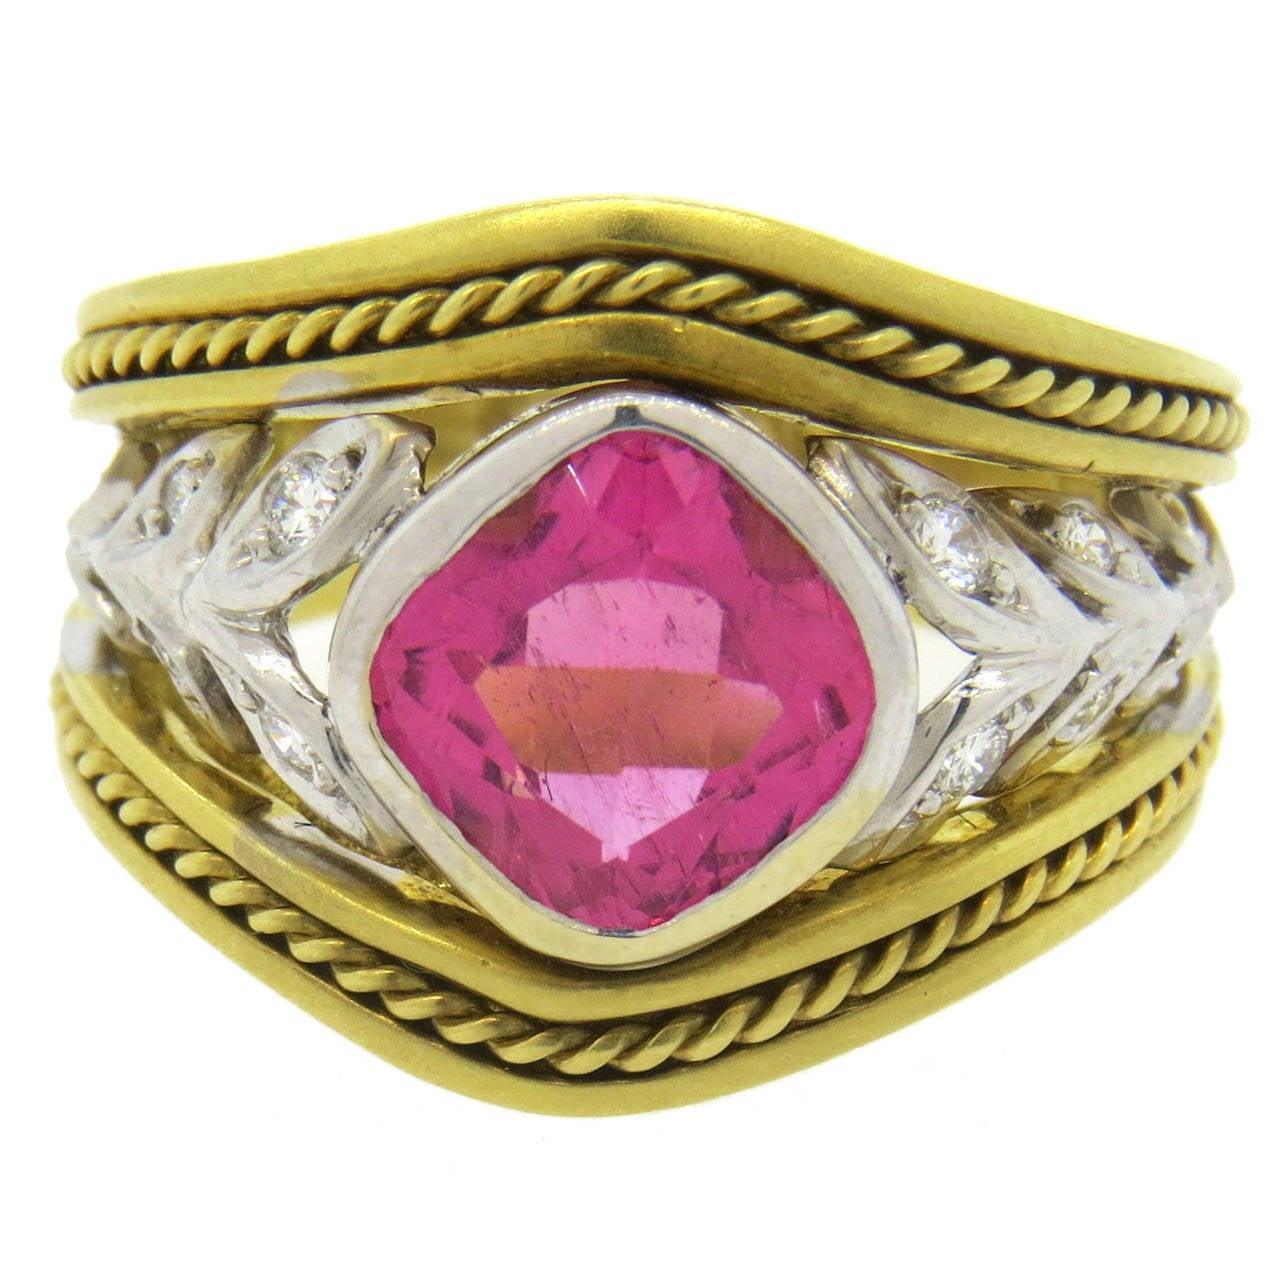 seidengang pink tourmaline gold ring at 1stdibs